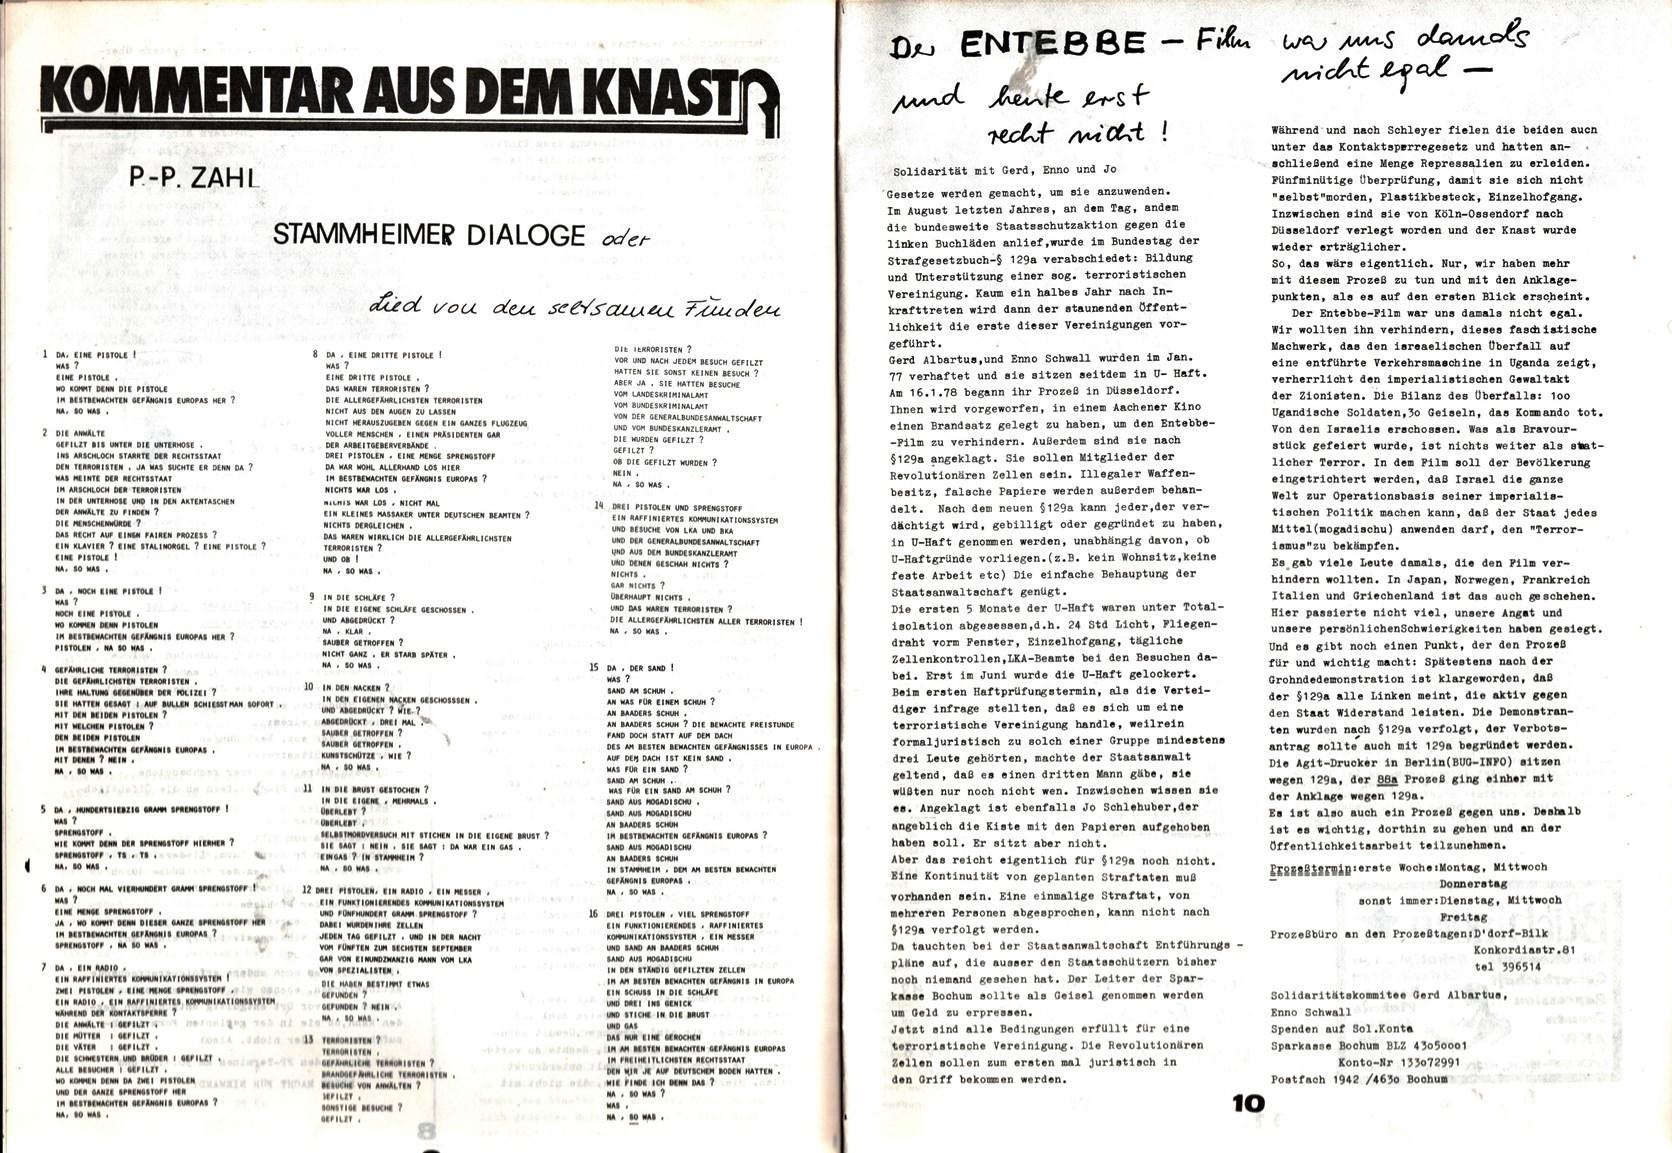 Duesseldorf_Gegenwind_19780200_006